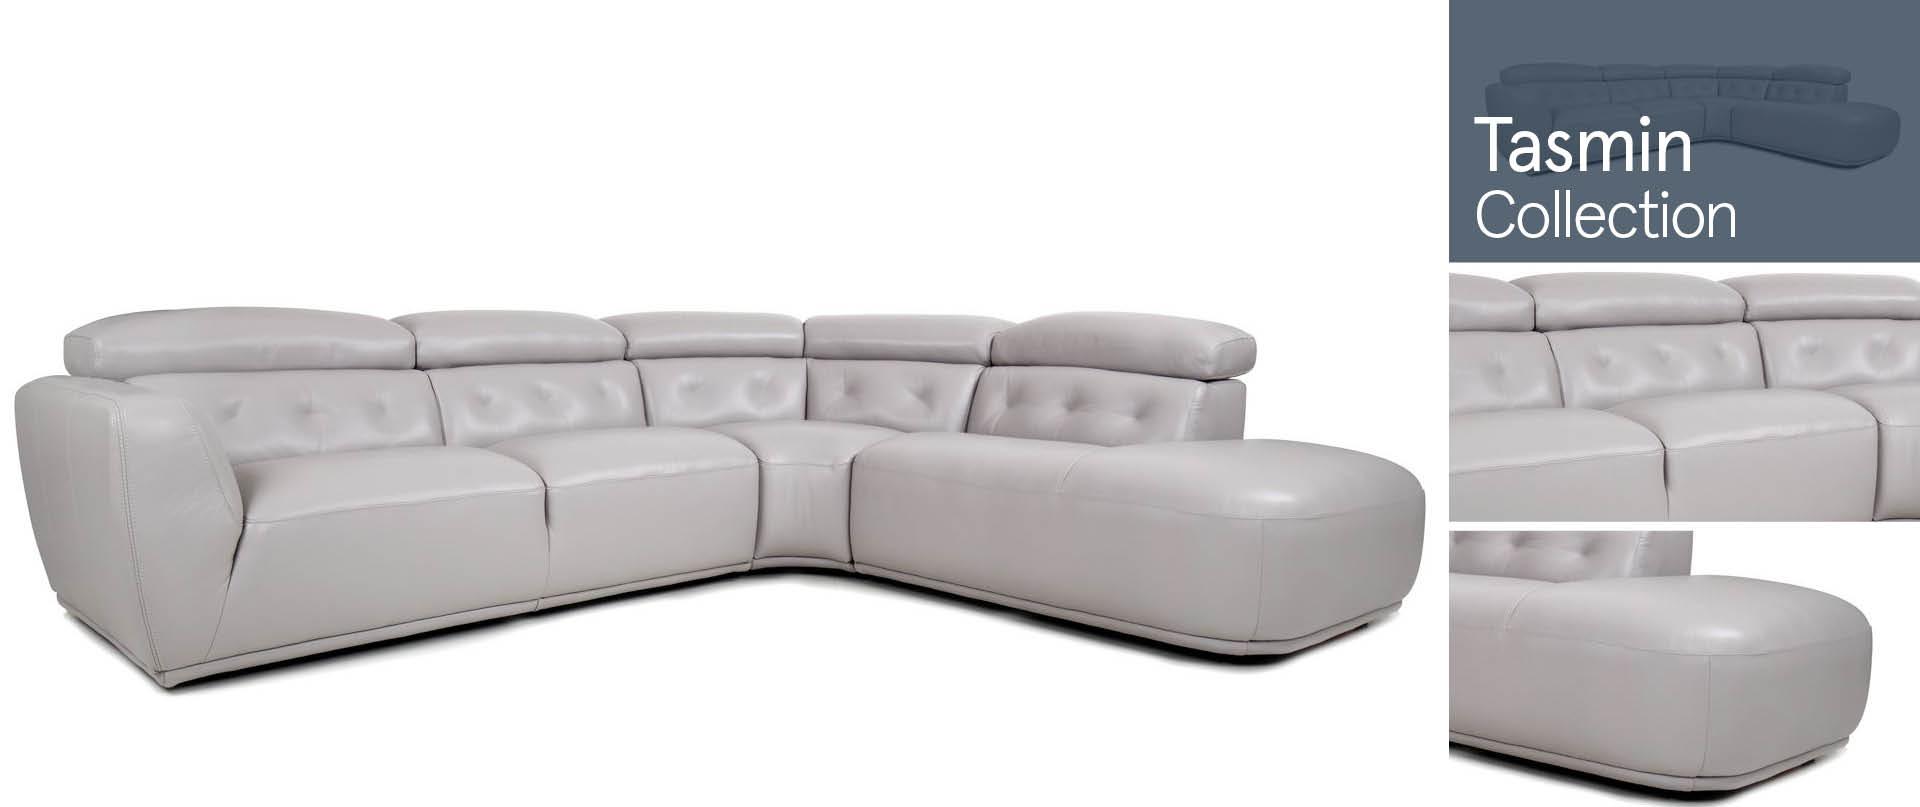 Tasmin Leather Sofa Ranges